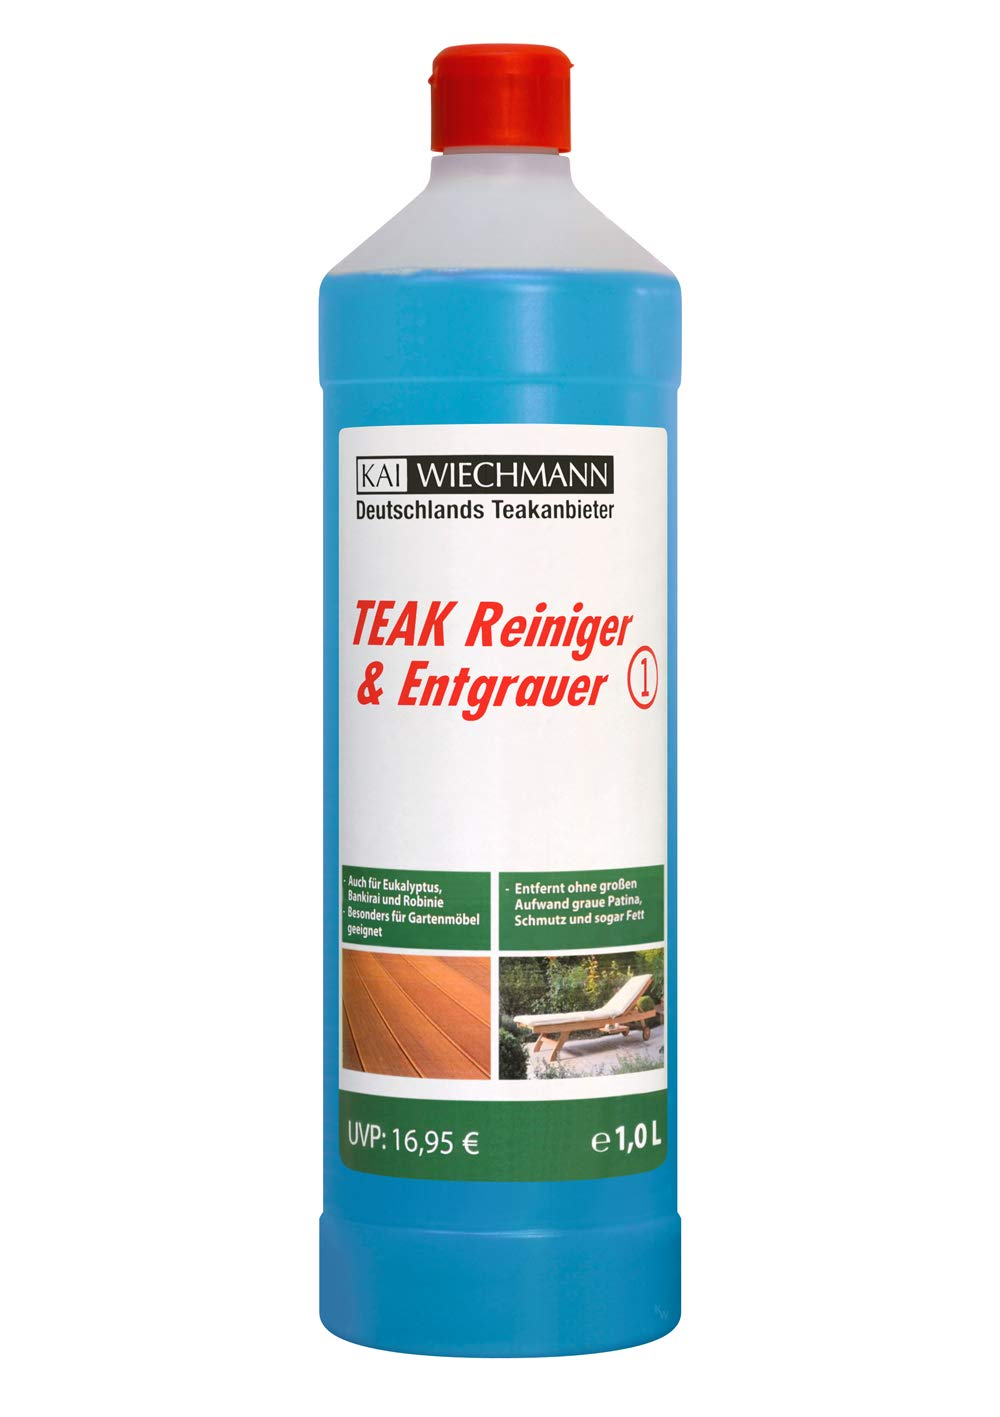 Berühmt Teak-Entgrauer & Reiniger Teakpflege 1 Liter entfernt graue Patina SU76